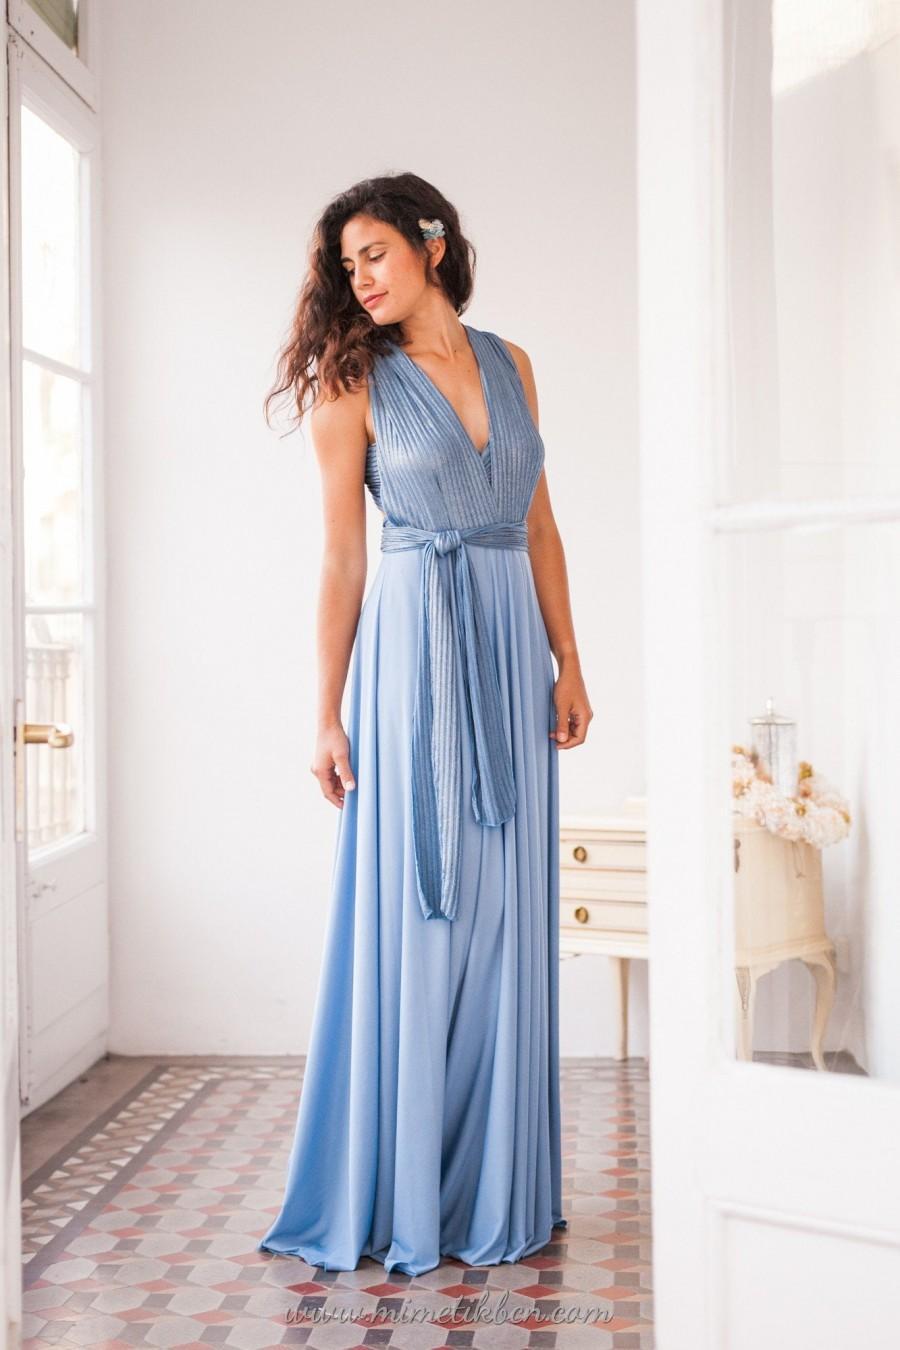 زفاف - Bridesmaid dress light blue, Bridesmaid multi way dress light blue, Placid blue bridesmaid dress, Bridesmaid dress blue long, Infinity dress